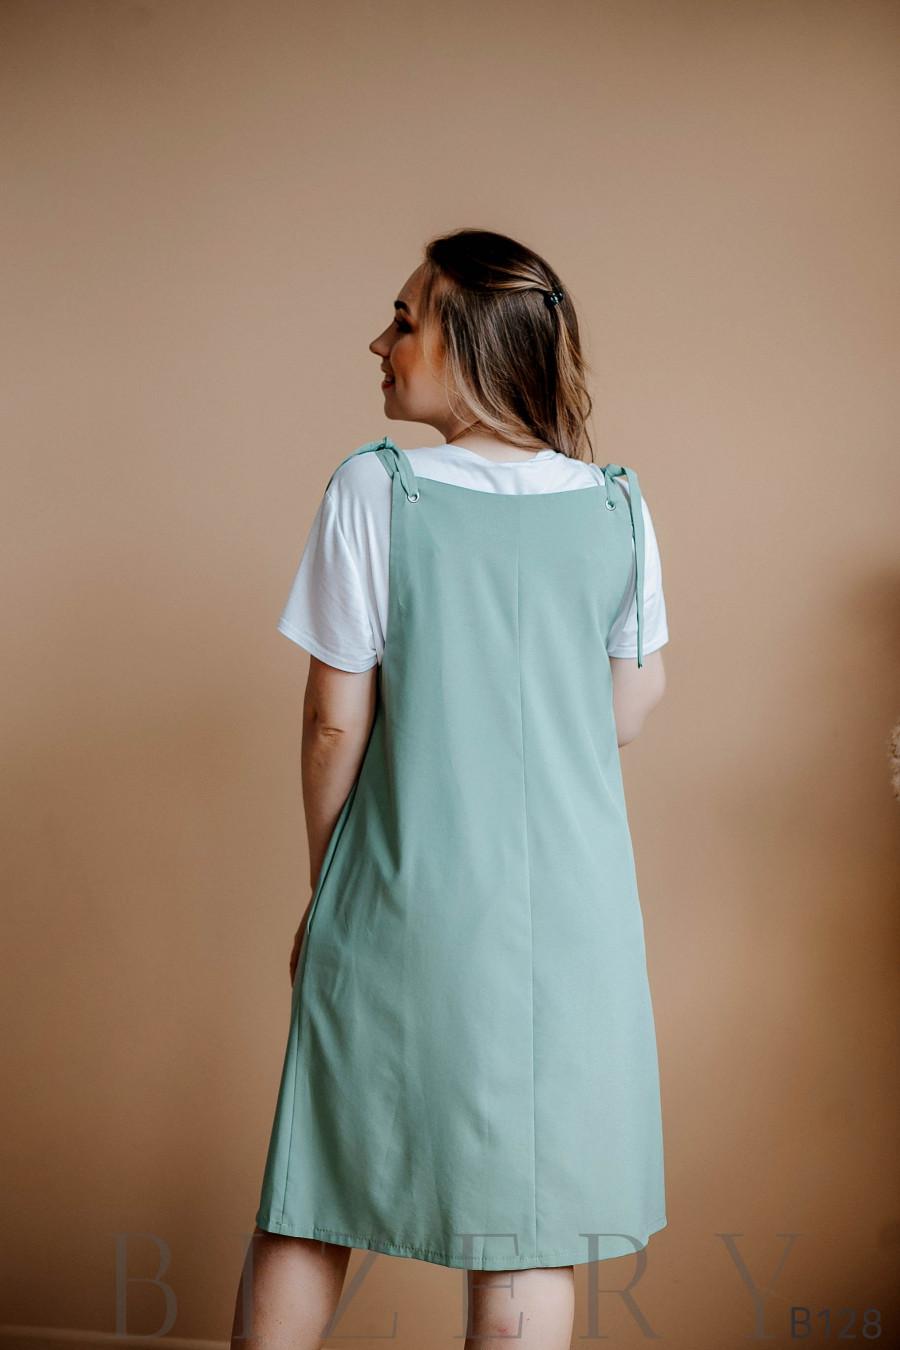 Сарафан фисташковый свободного кроя на завязках + мягкая белая футболка